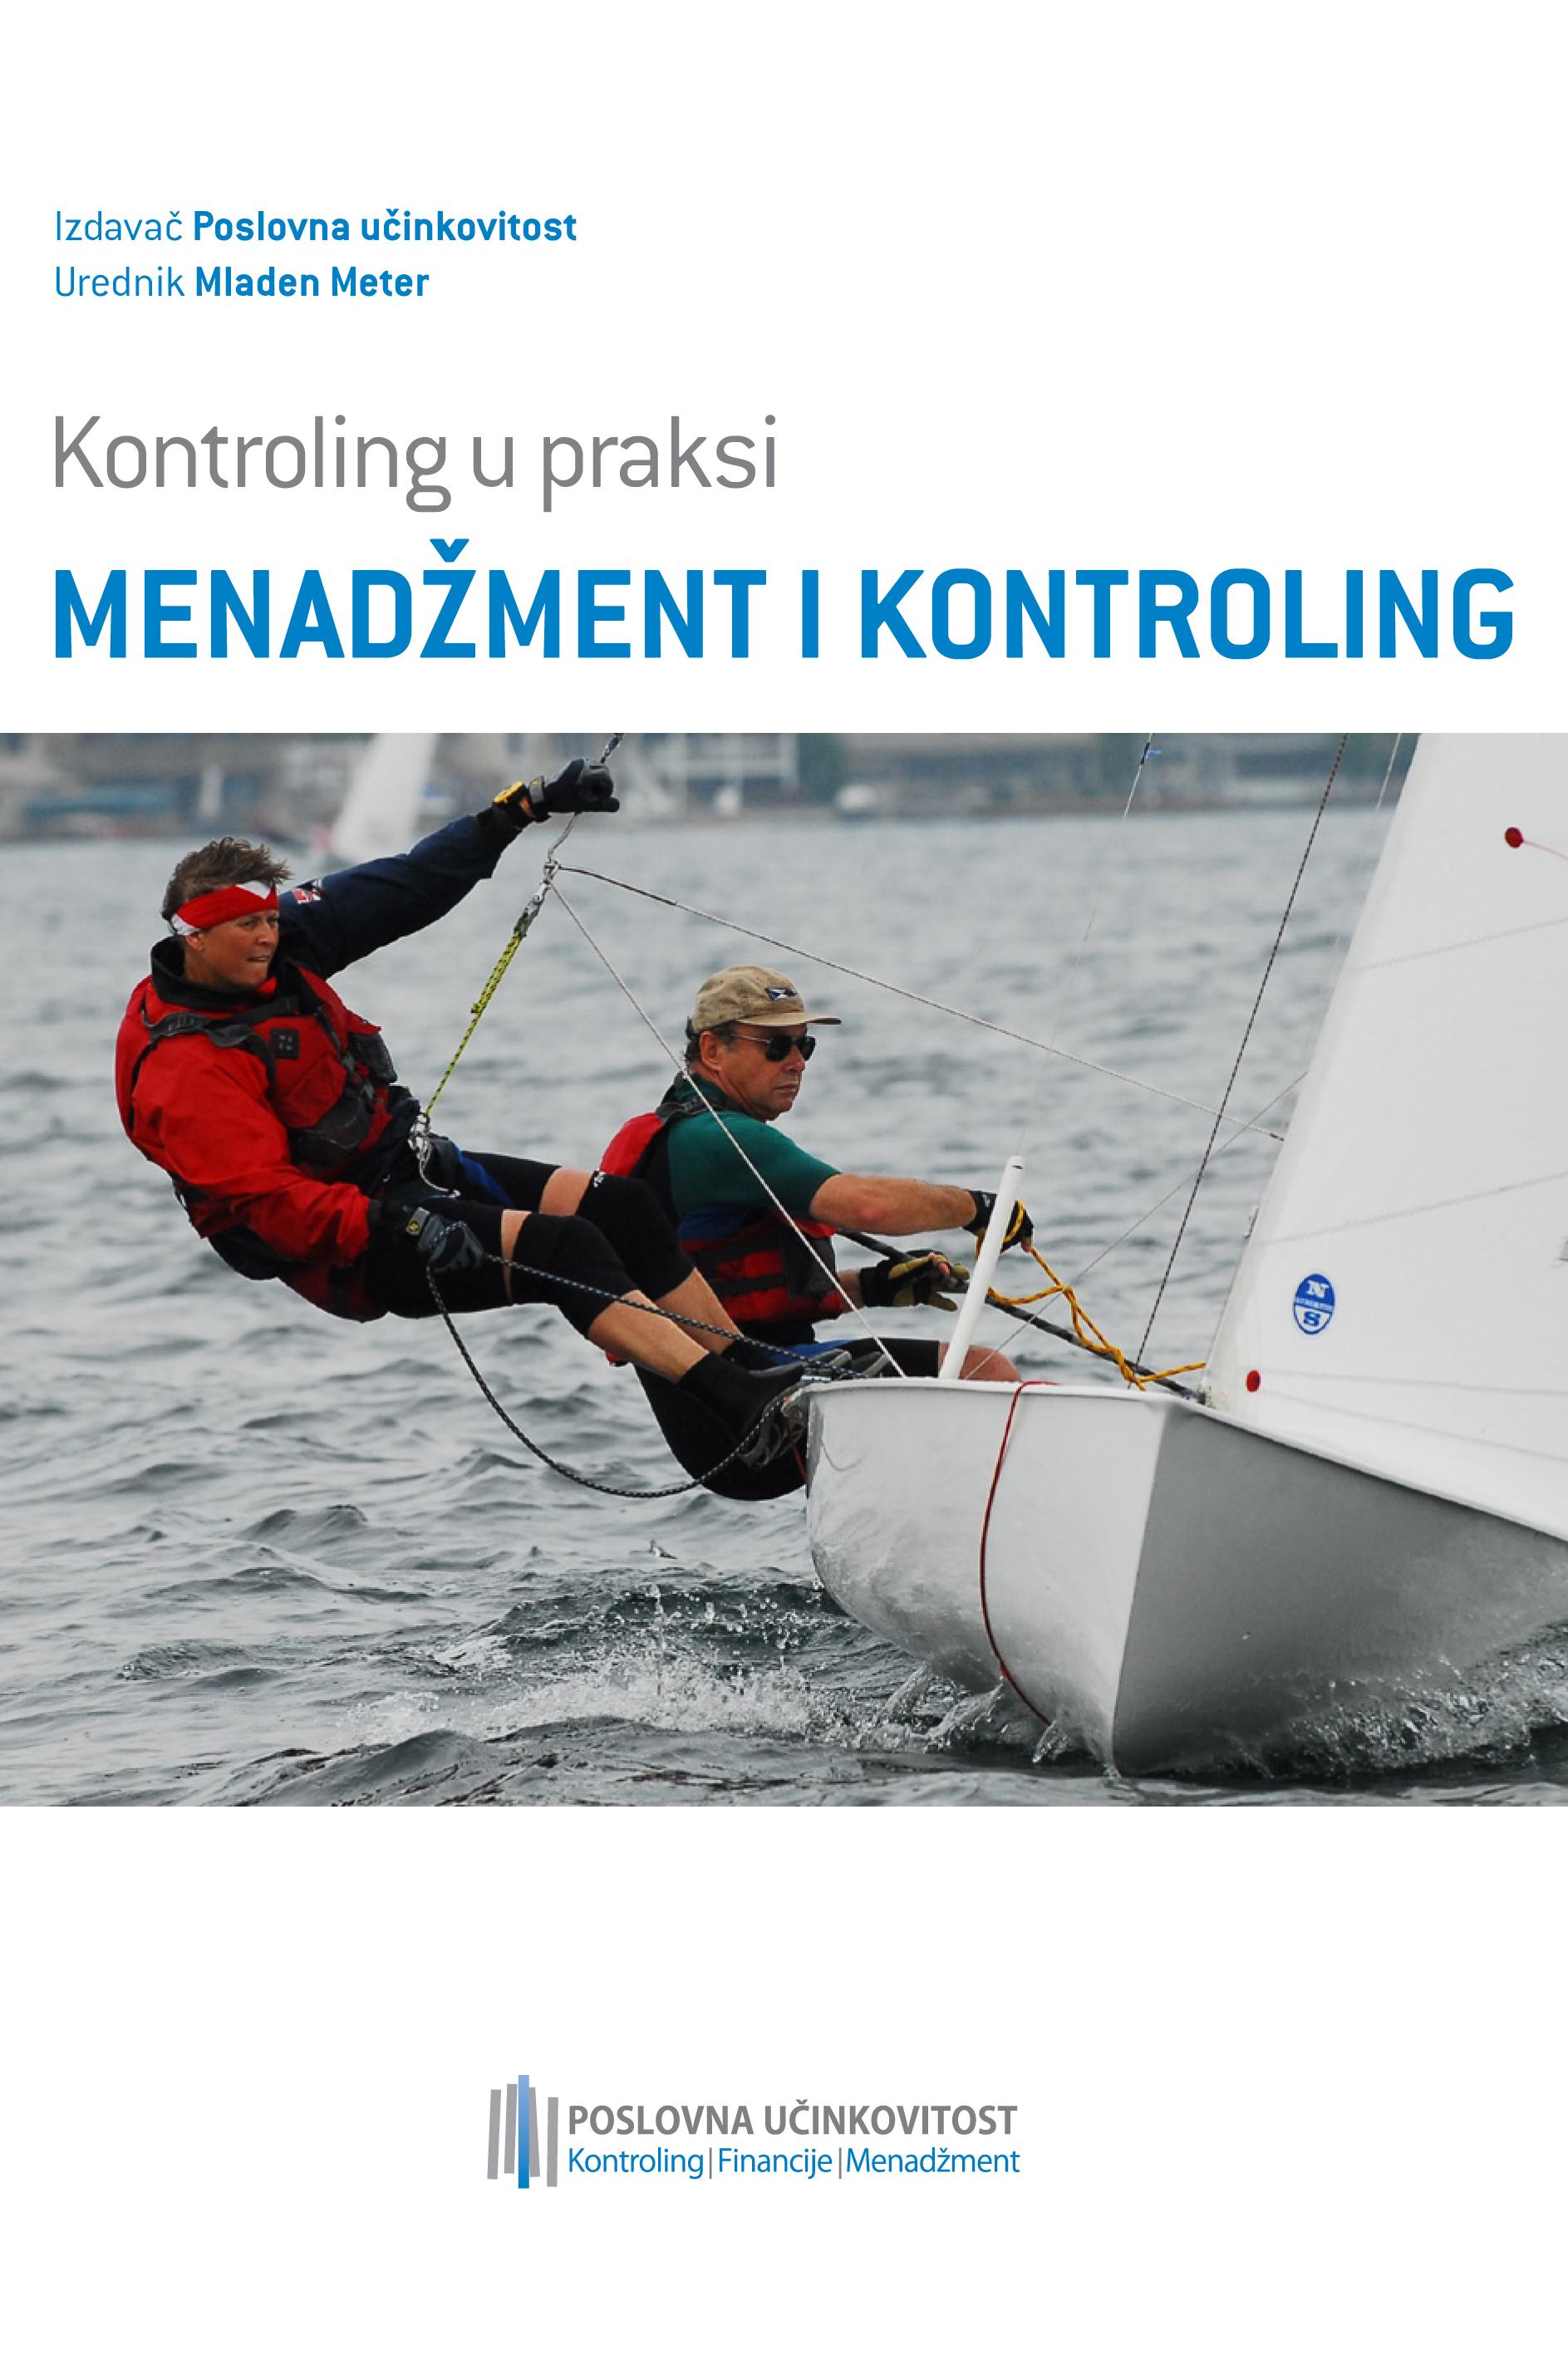 [KNJIGA] Menadžment i kontroling